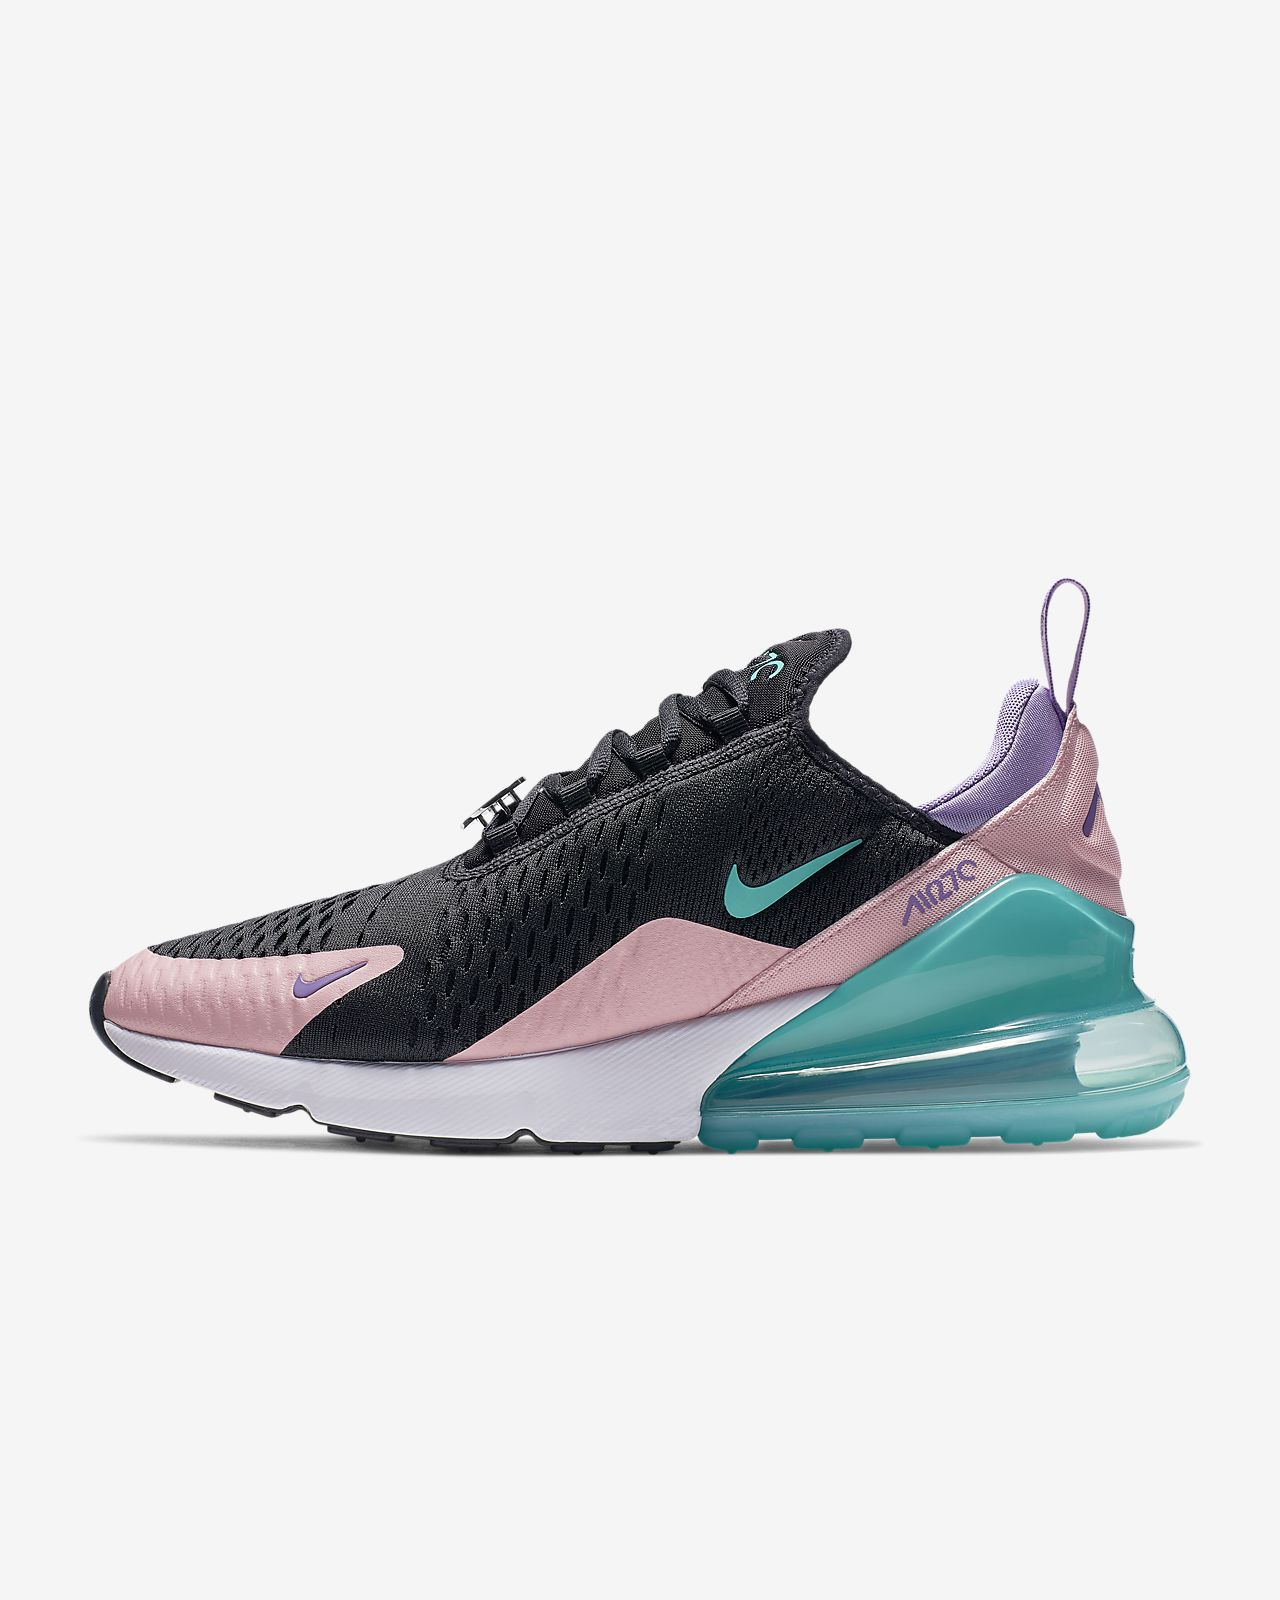 a5b6fc73745f85 Nike Air Max 270 Men s Shoe . Nike.com